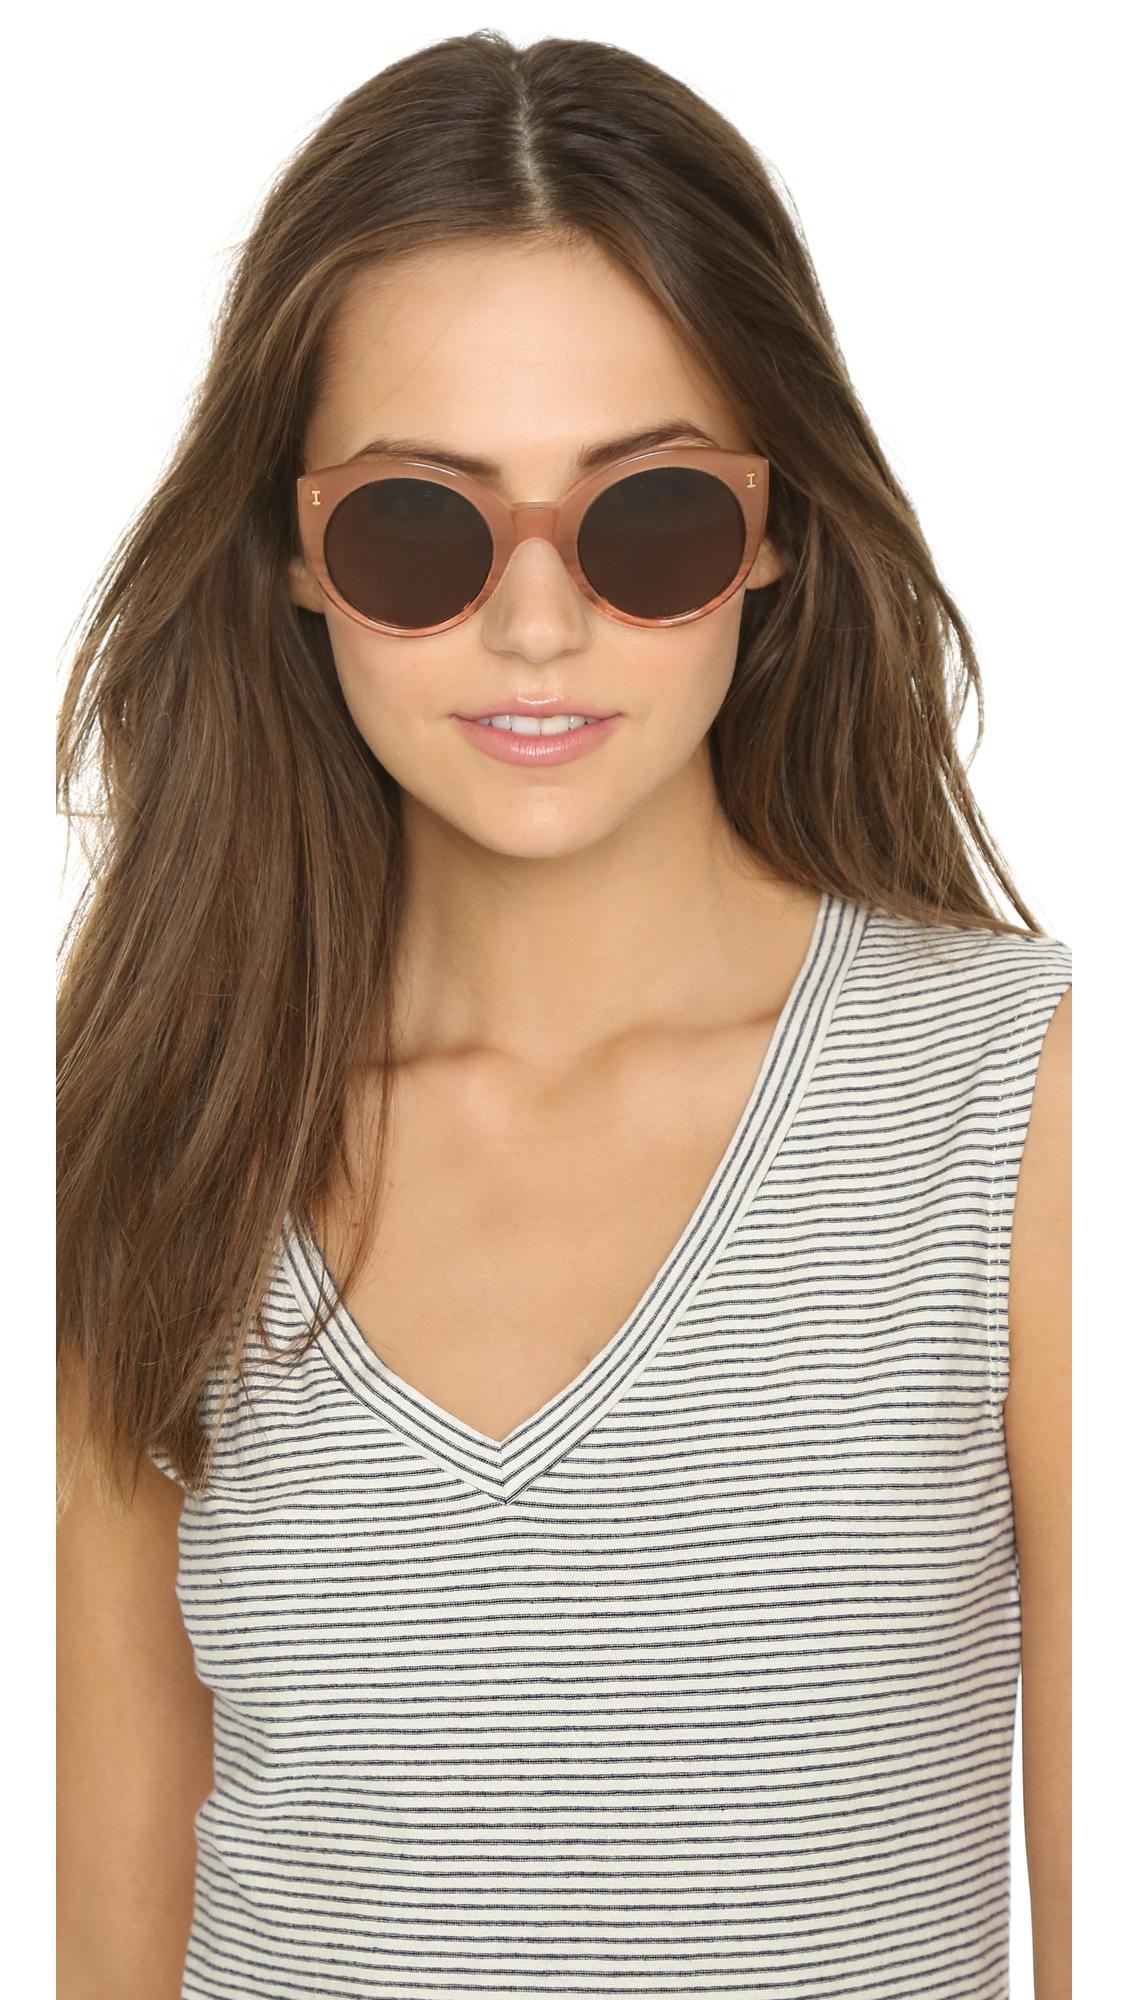 b701aed5cd6 Illesteva Palm Beach Sunglasses